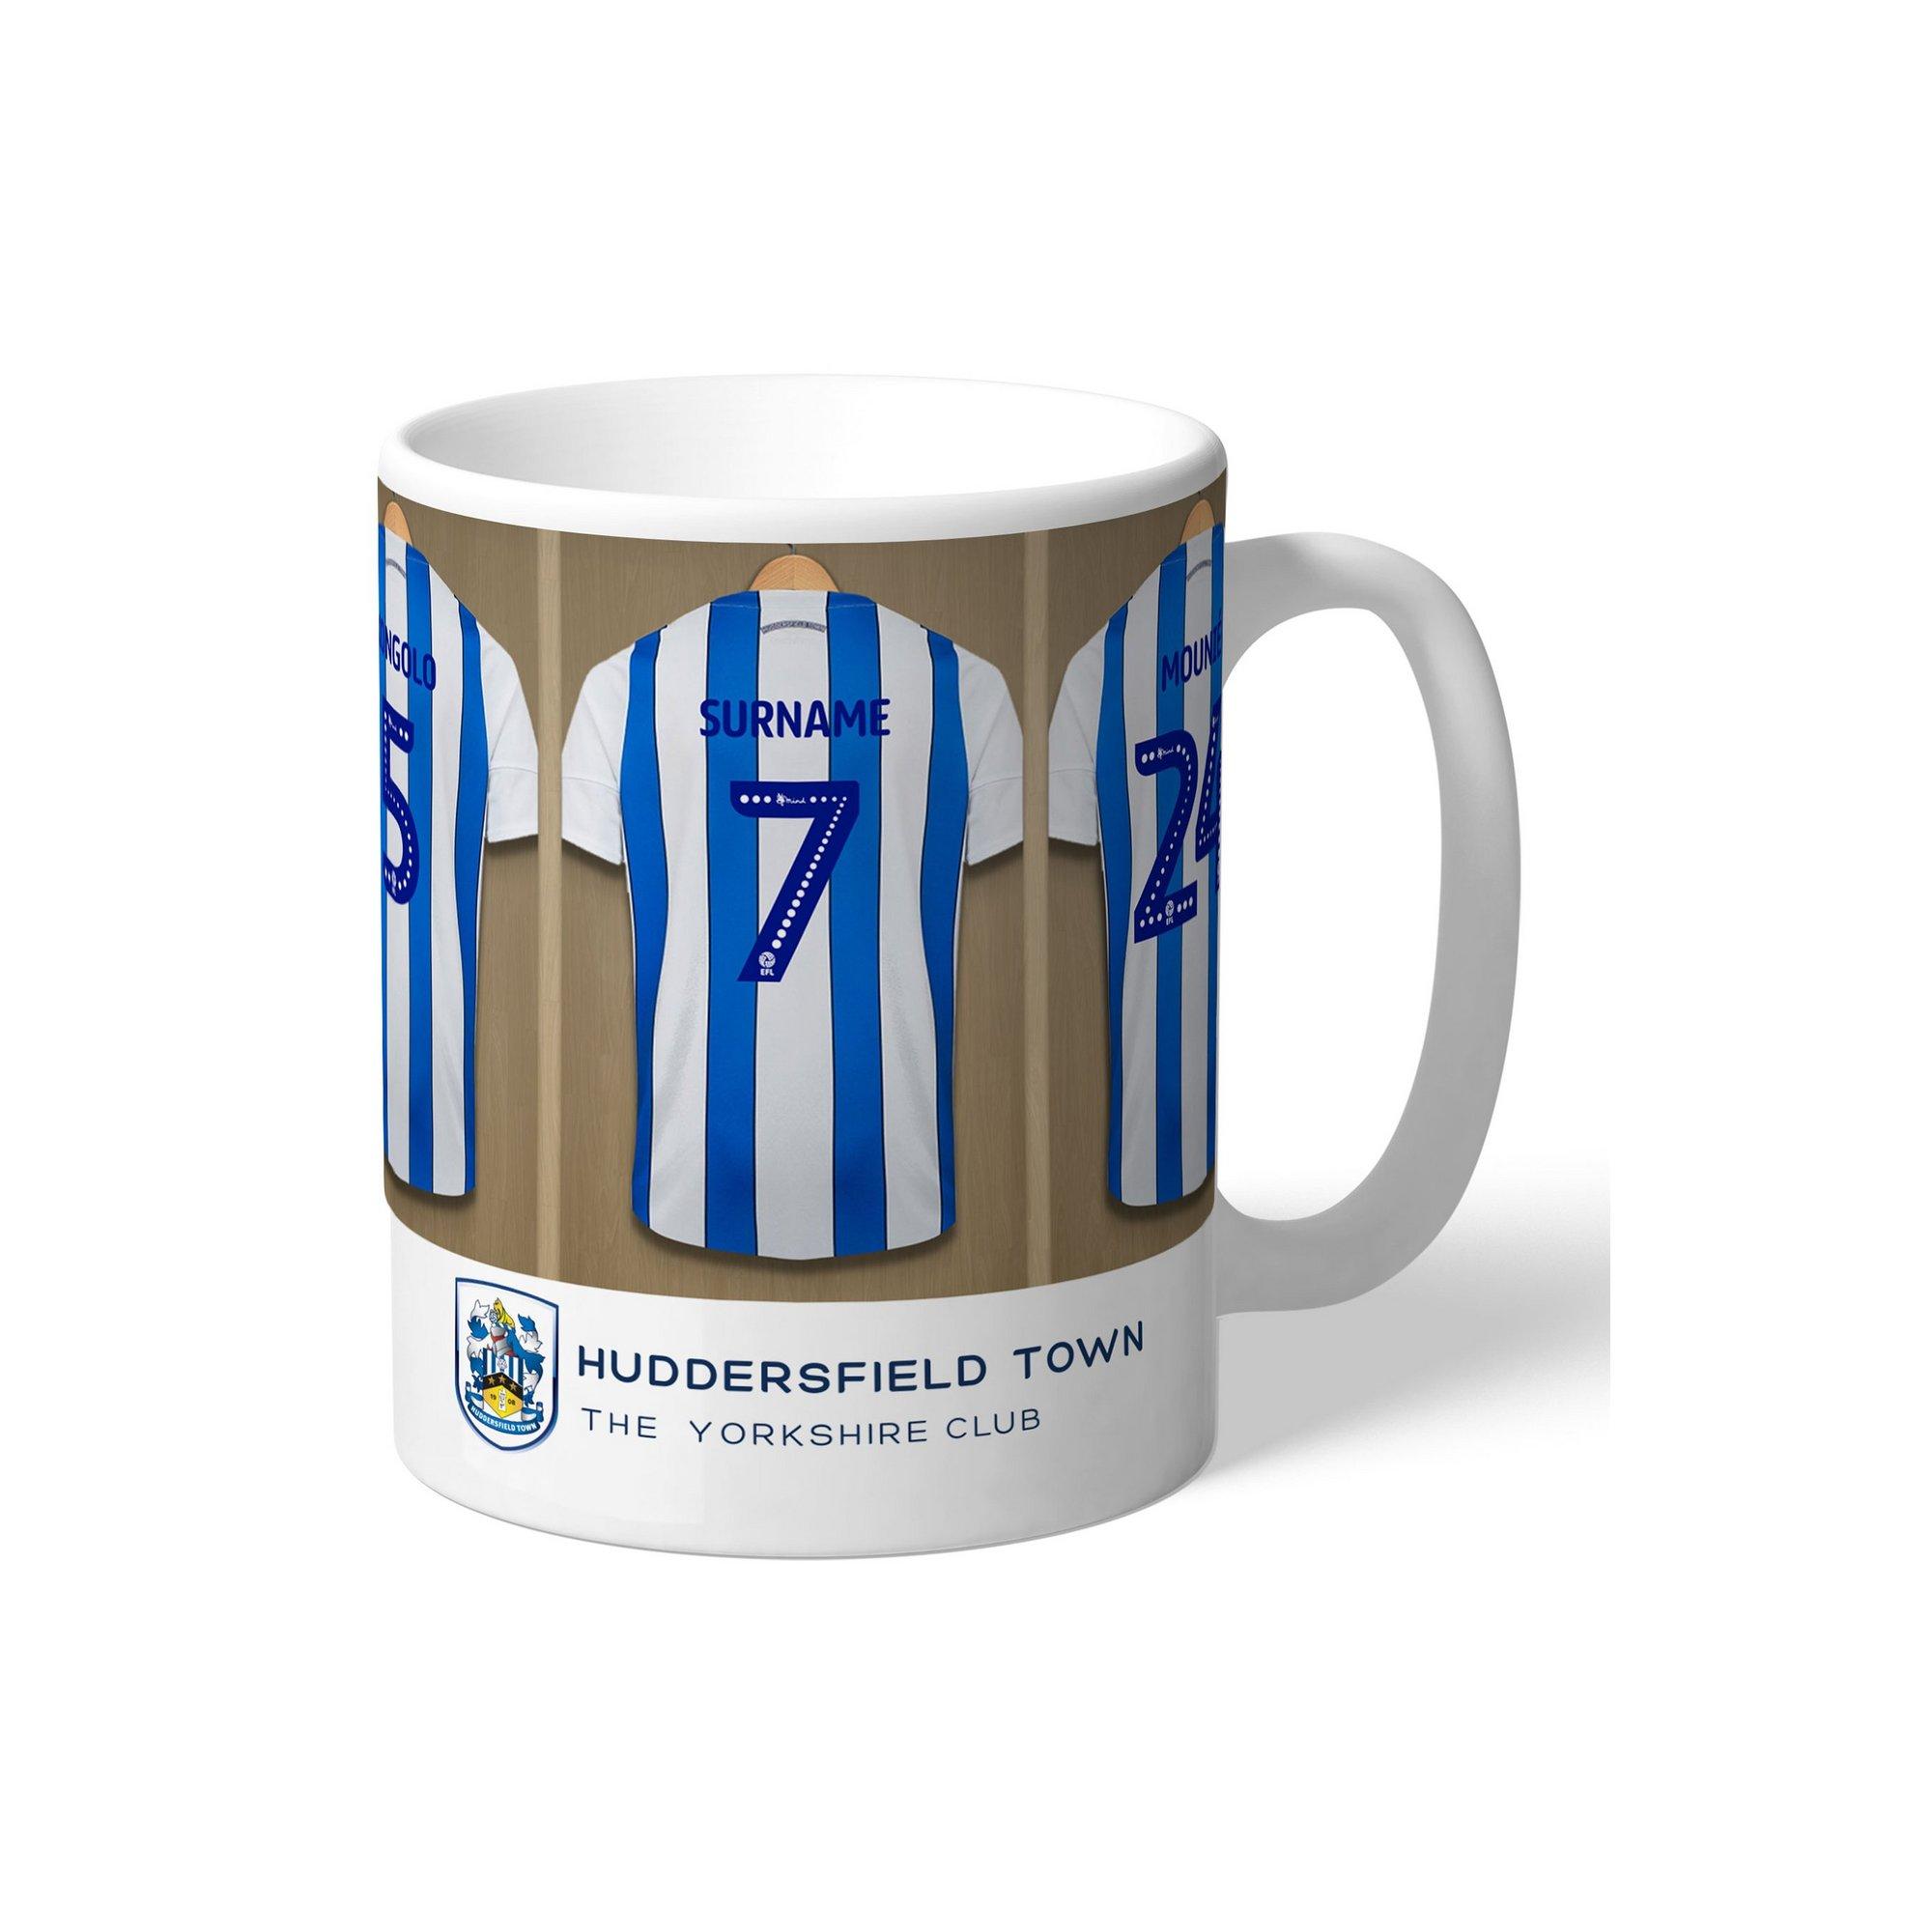 Image of Personalised Huddersfield Town AFC Dressing Room Mug